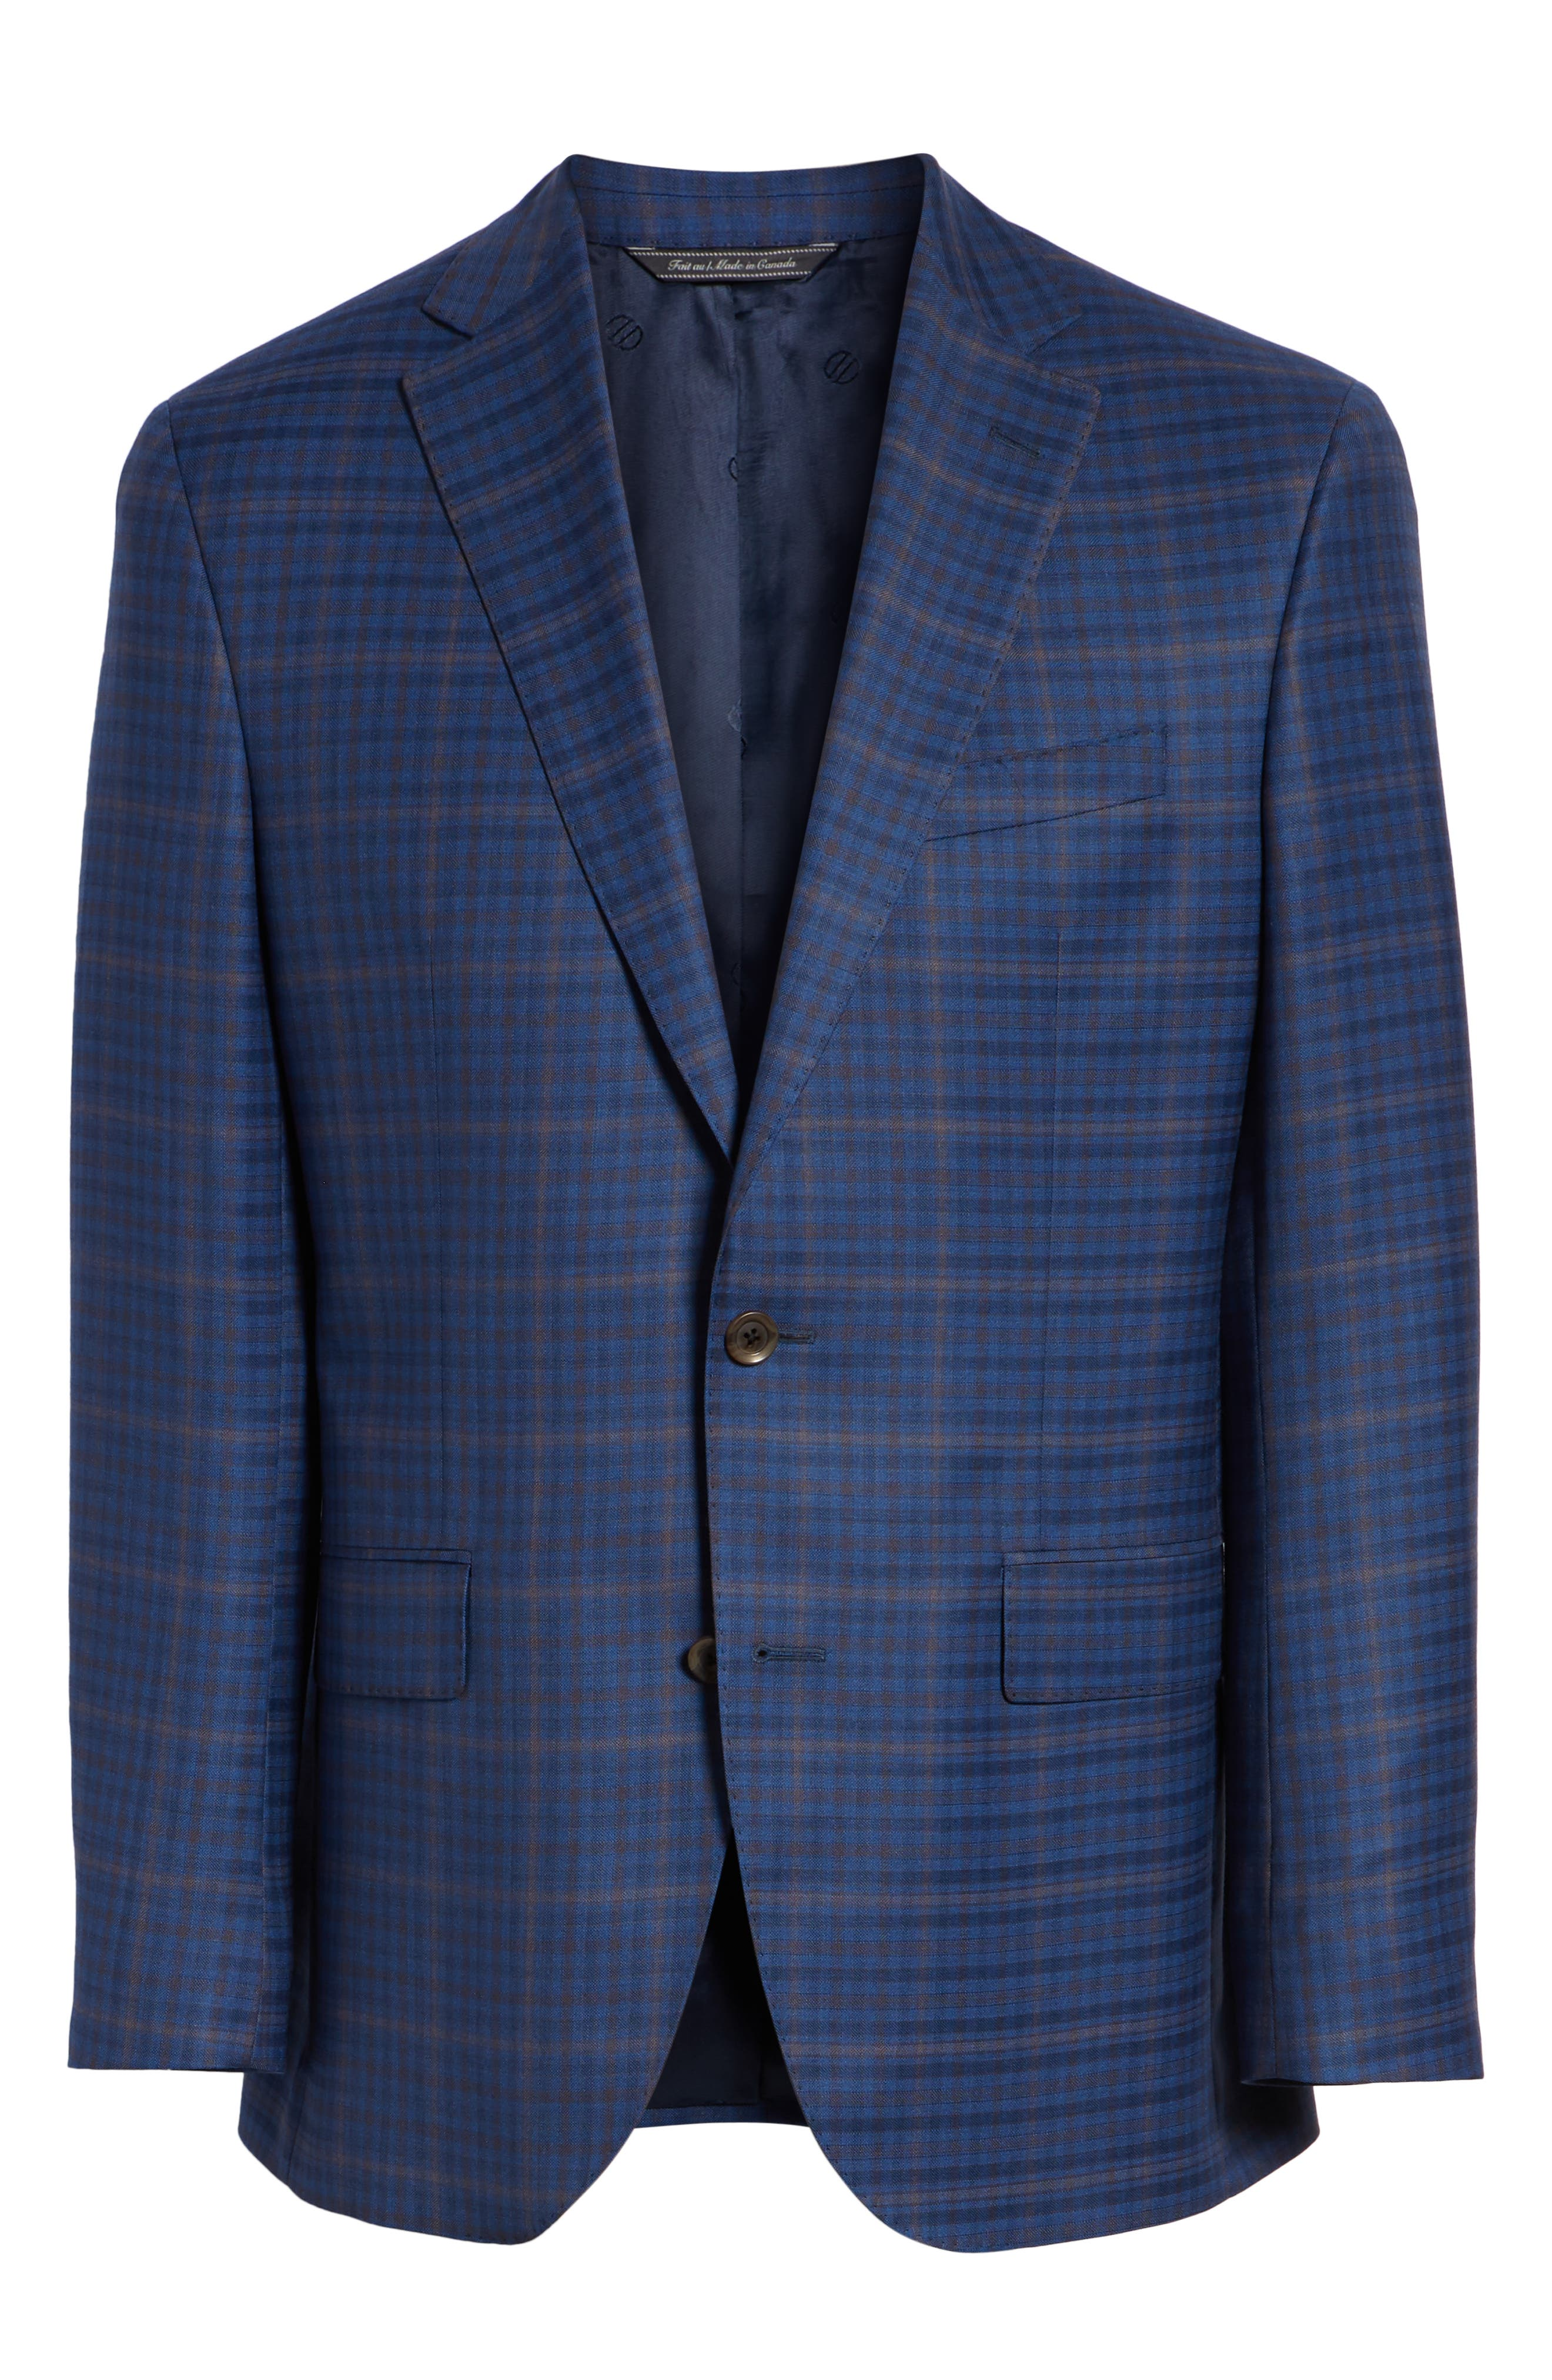 DAVID DONAHUE,                             Connor Classic Fit Plaid Wool Sport Coat,                             Alternate thumbnail 5, color,                             400